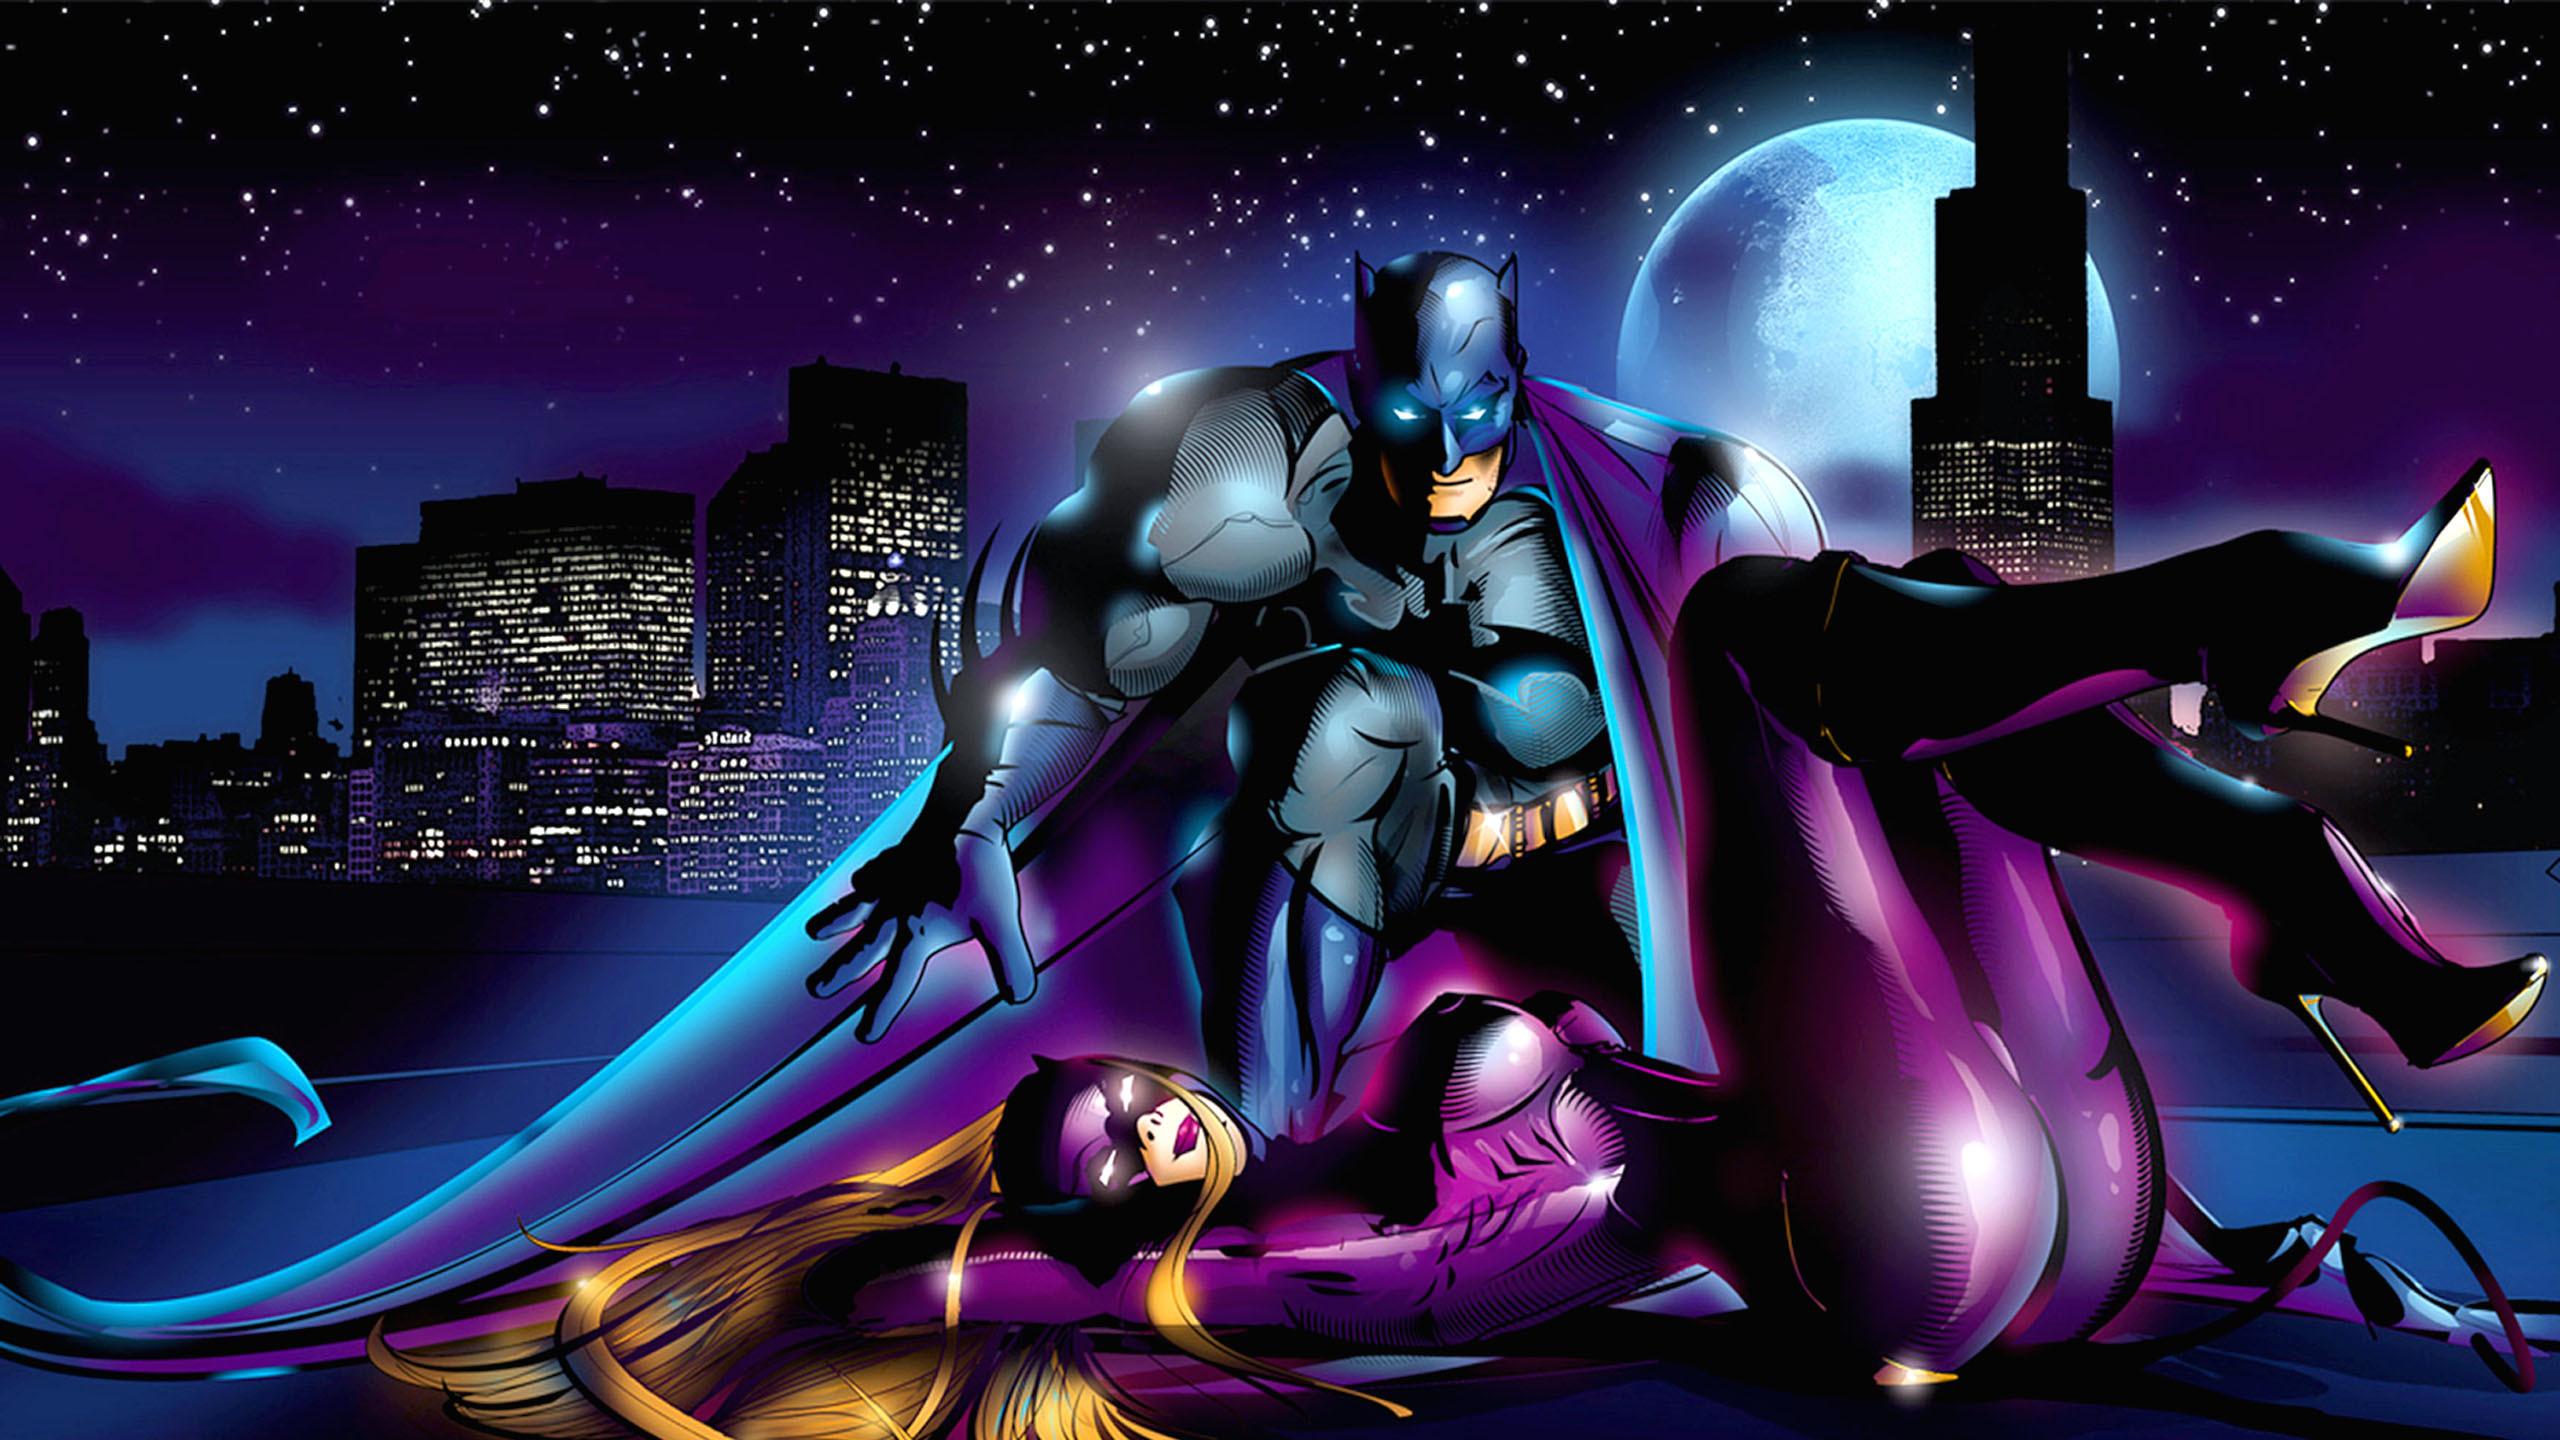 catwoman kisses batman – https://1080wallpaper.net/catwoman-kisses-